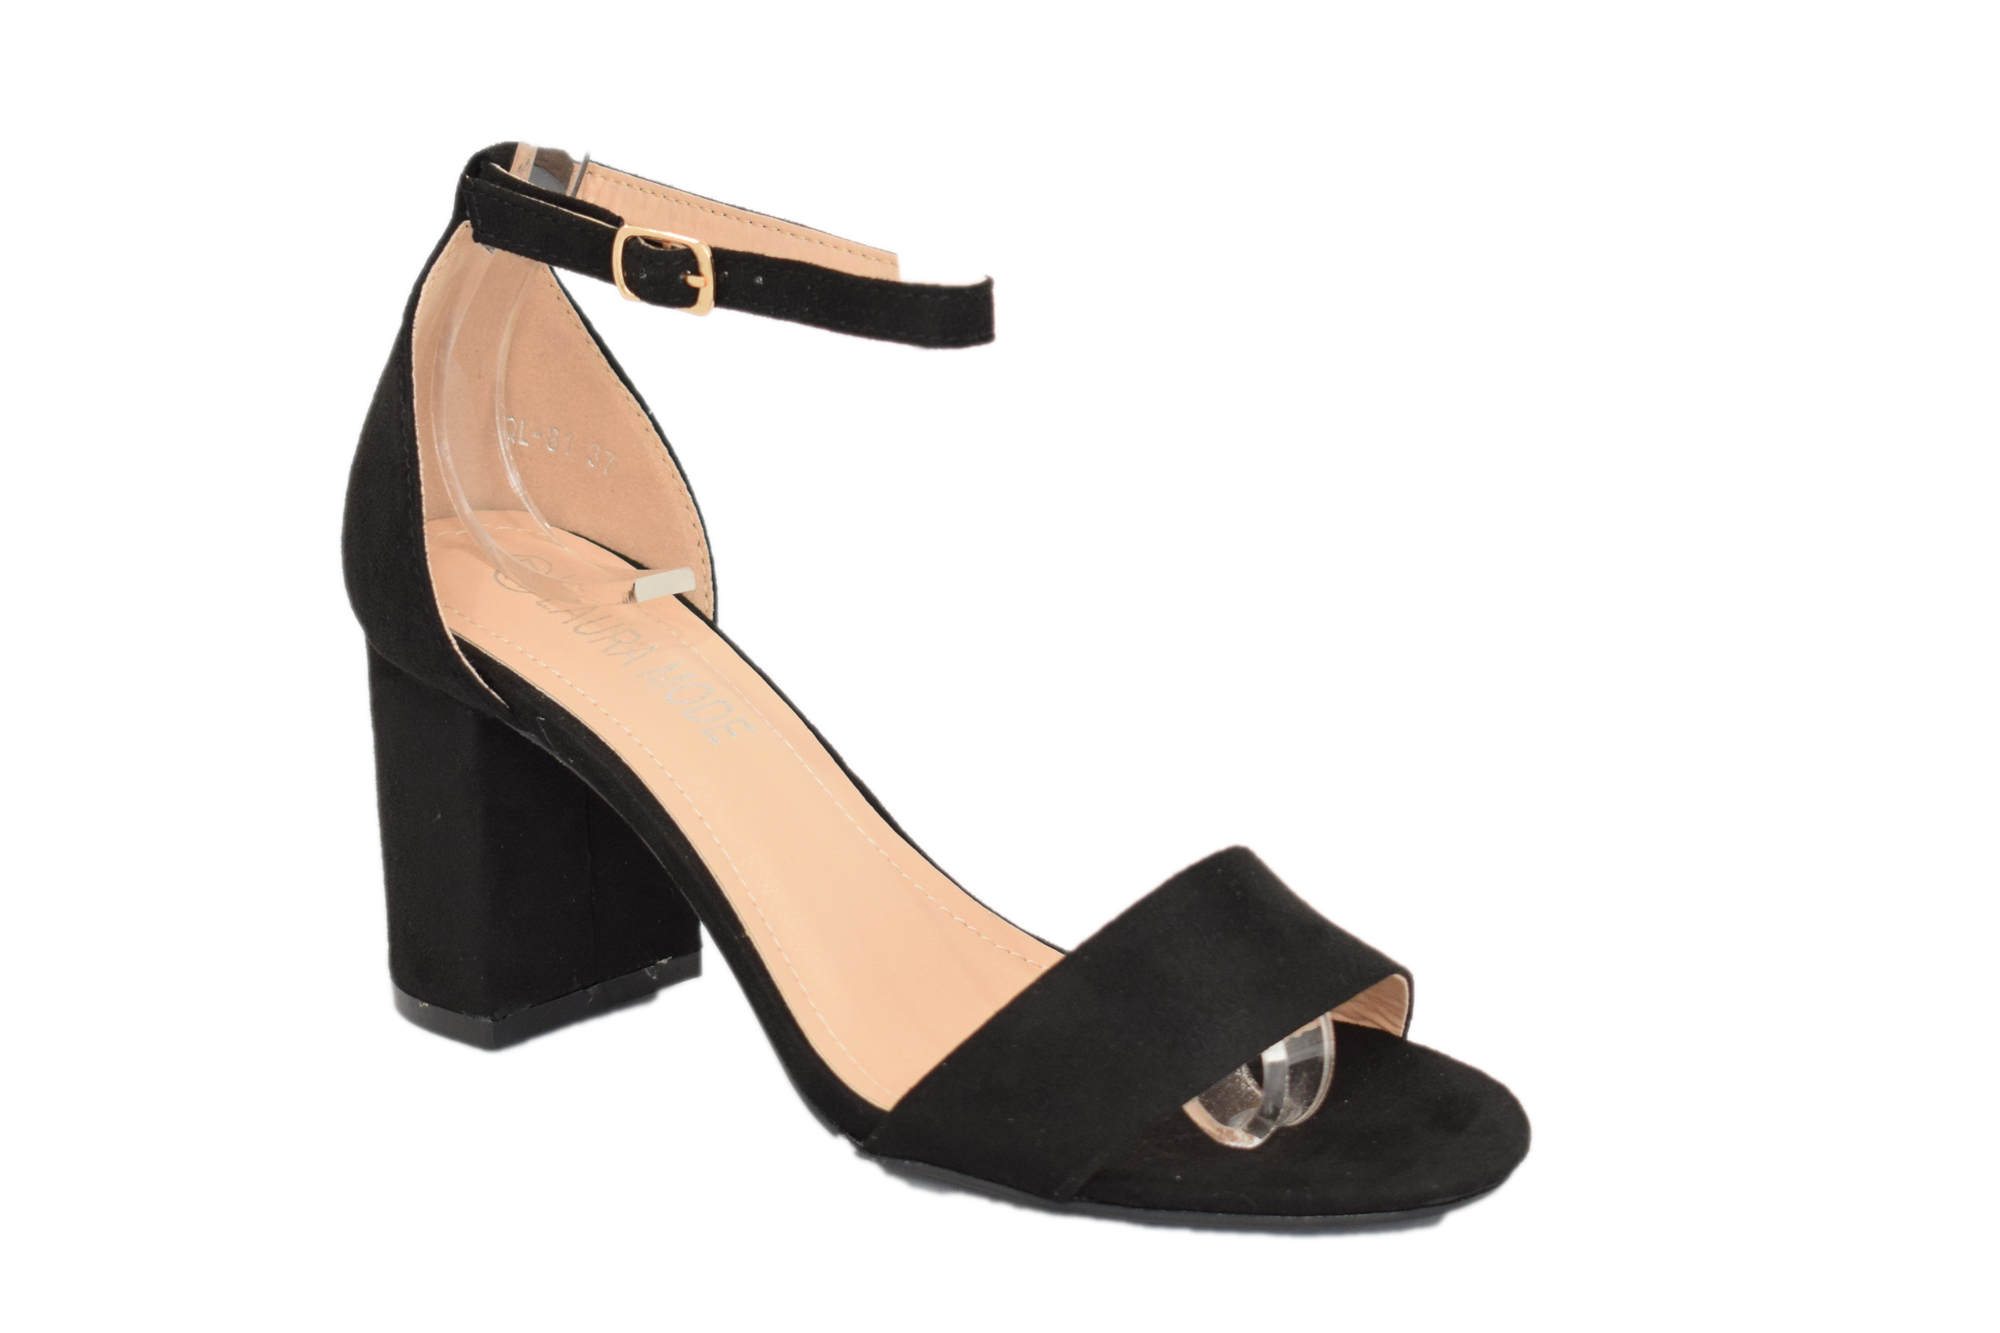 f4f00884b6 Μαύρο σουέντ πέδιλο - Γυναικεία Παπούτσια - Steve   Paul